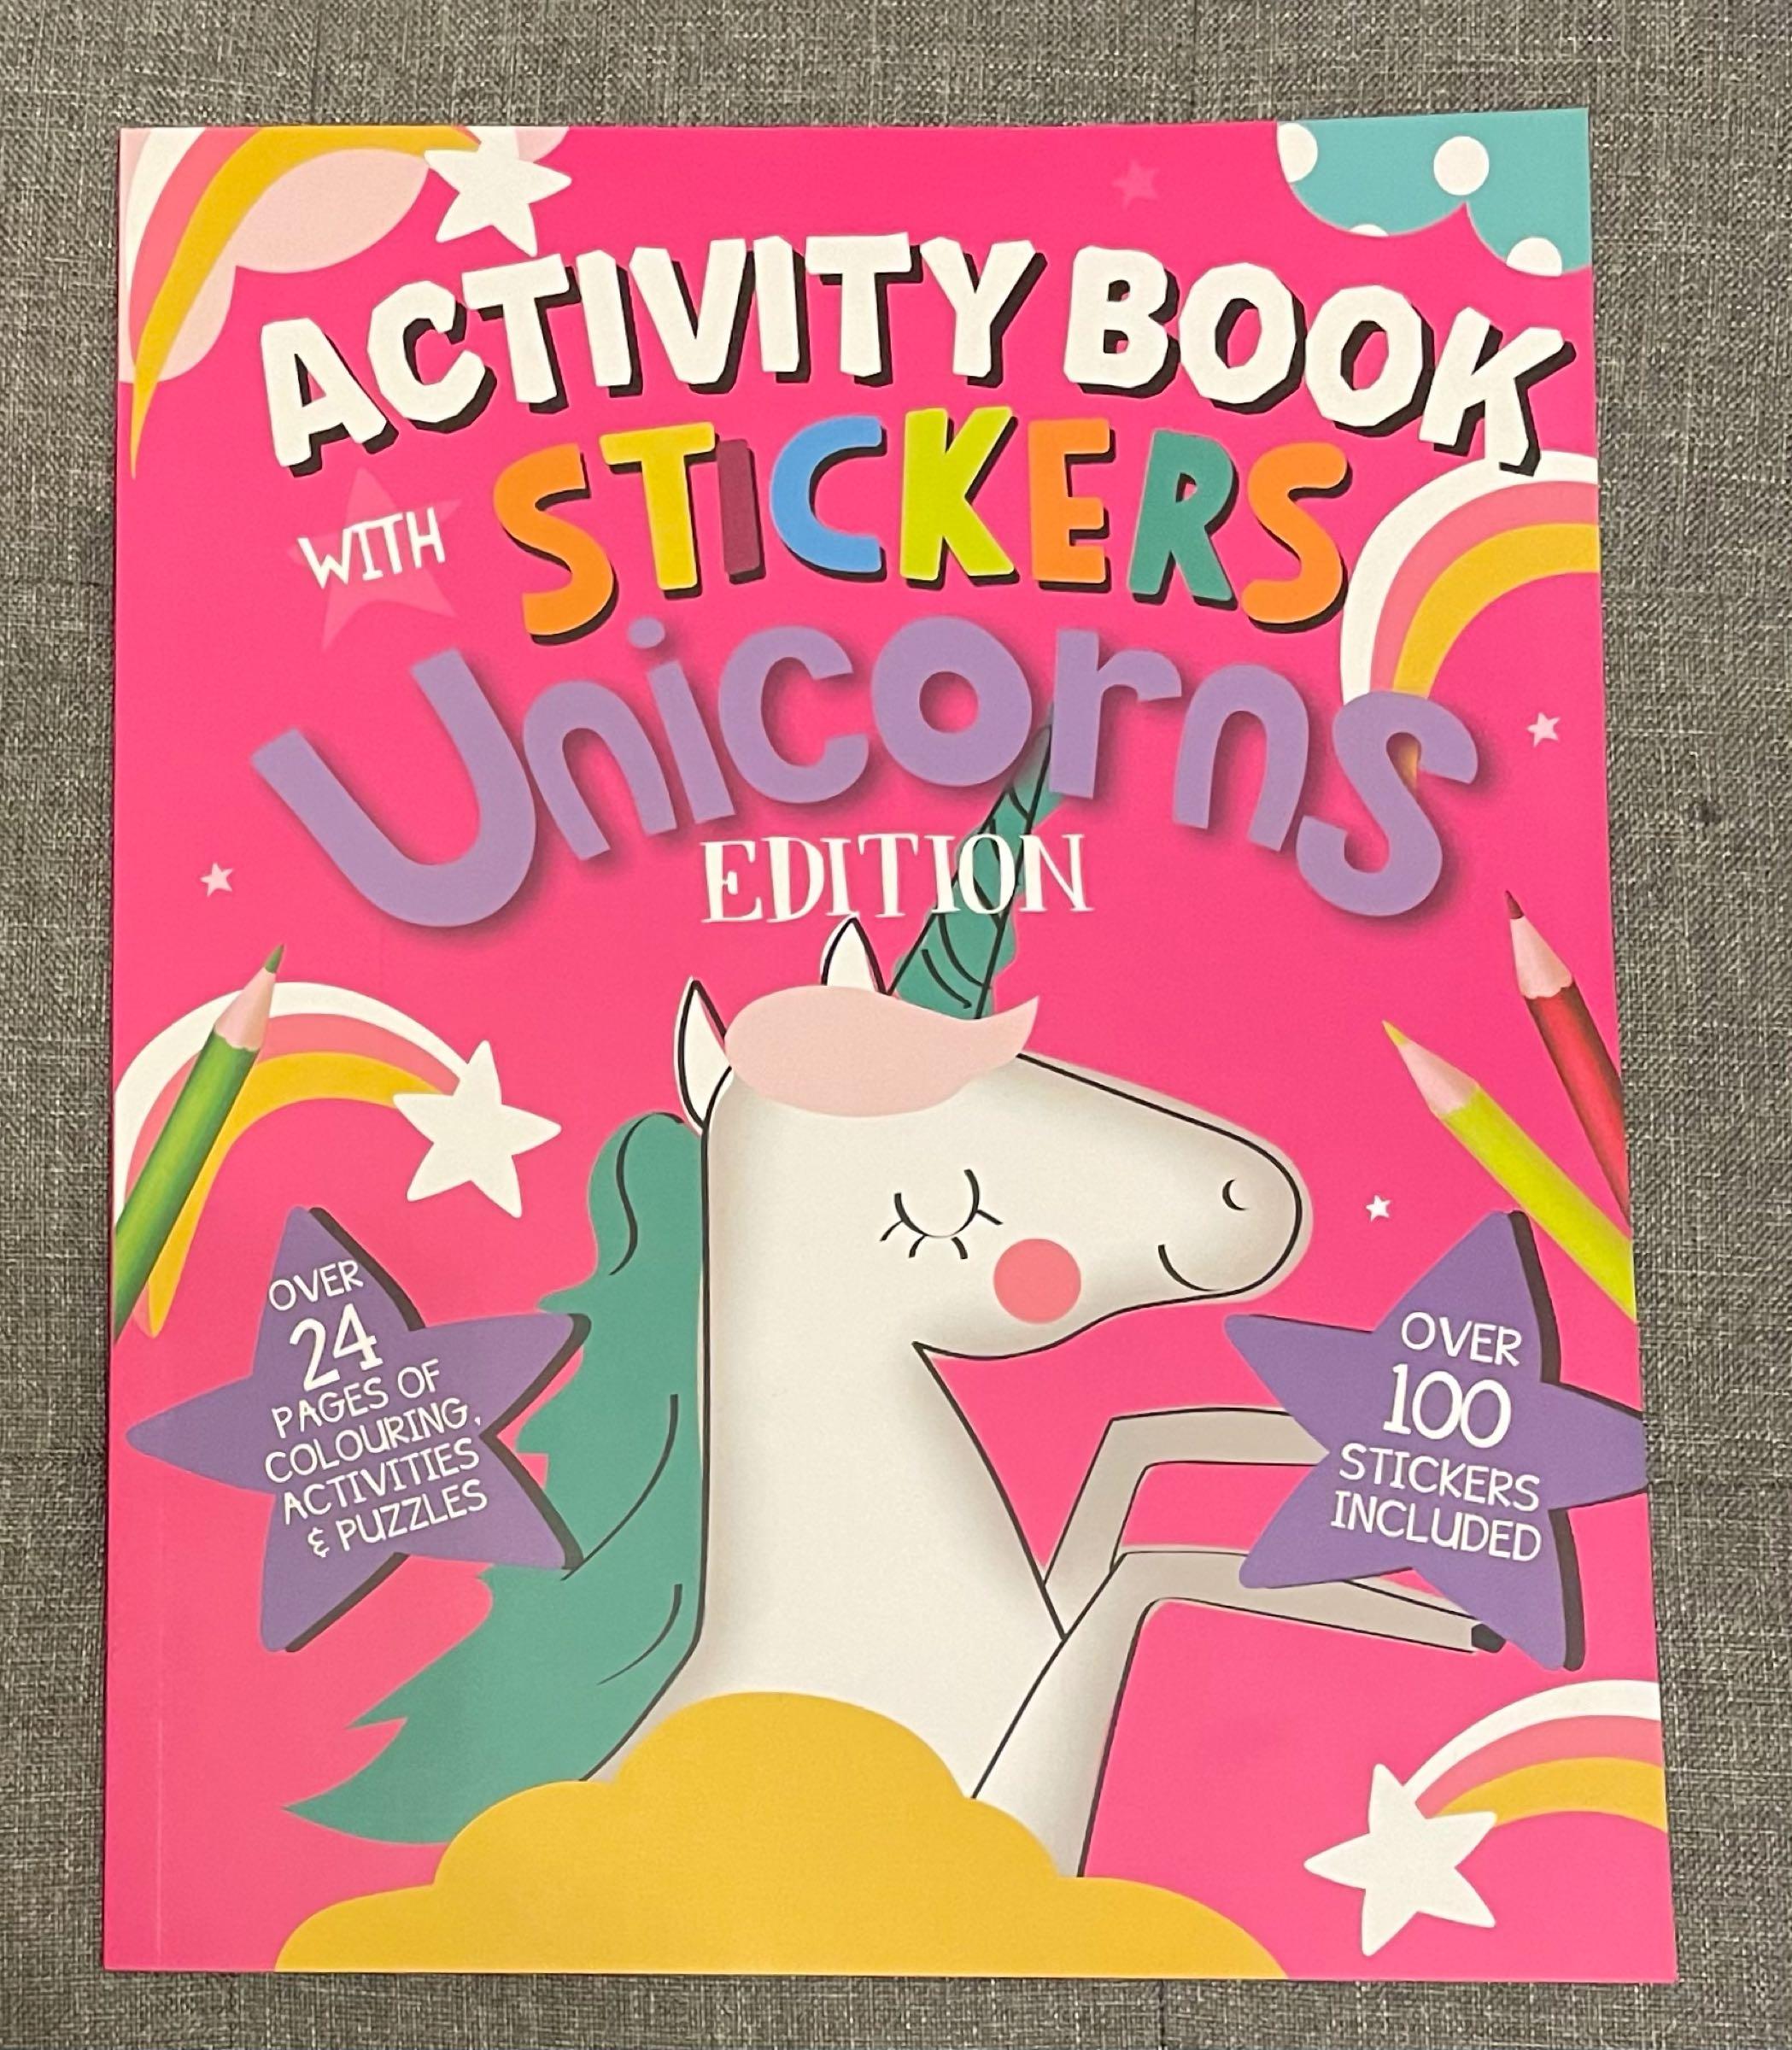 Unicorn sticker book